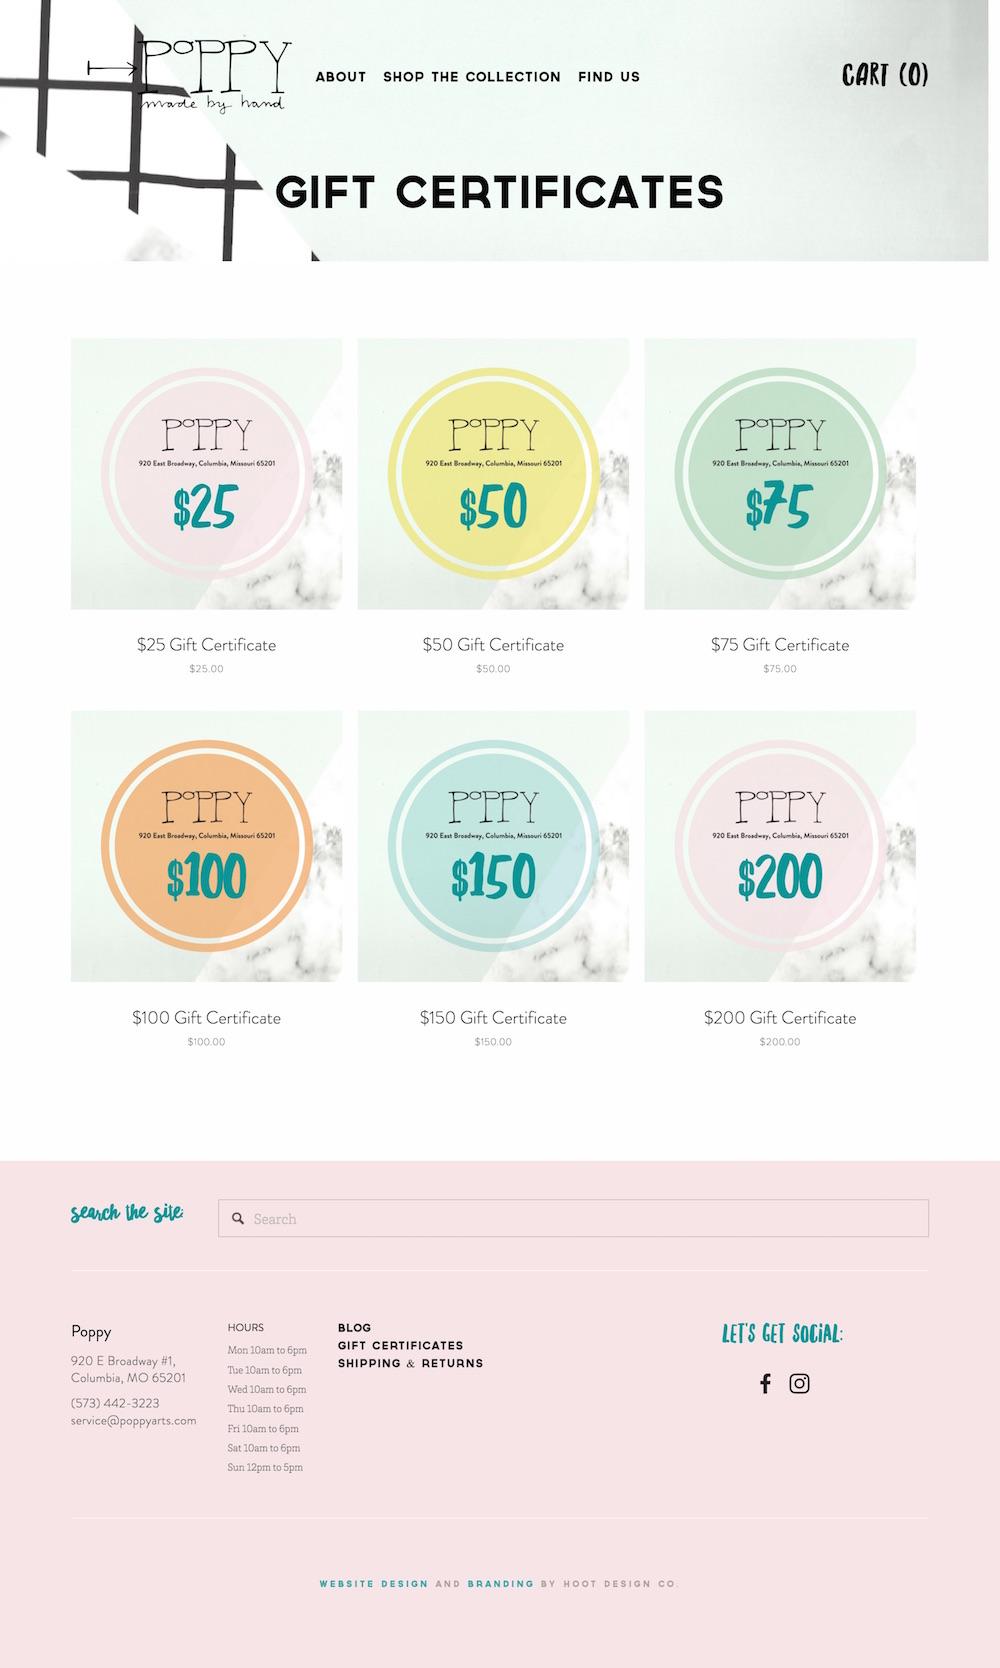 E-commerce gift certificates in the new Poppy website design | Hoot Design Co. web design in Columbia, MO